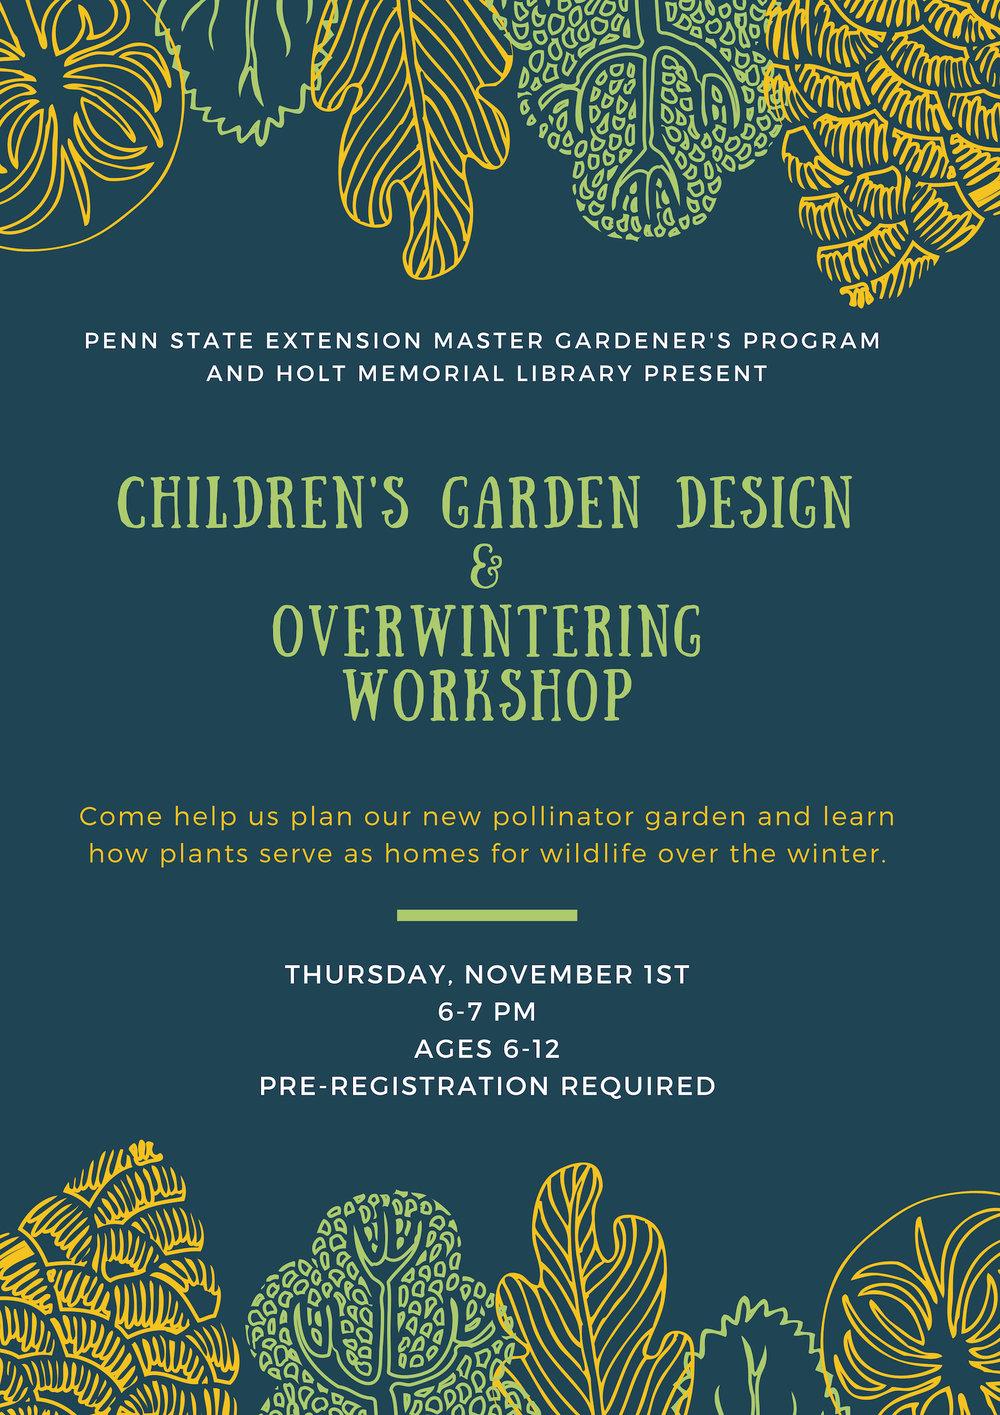 Garden Design and Overwintering Workshop Nov 1.jpg